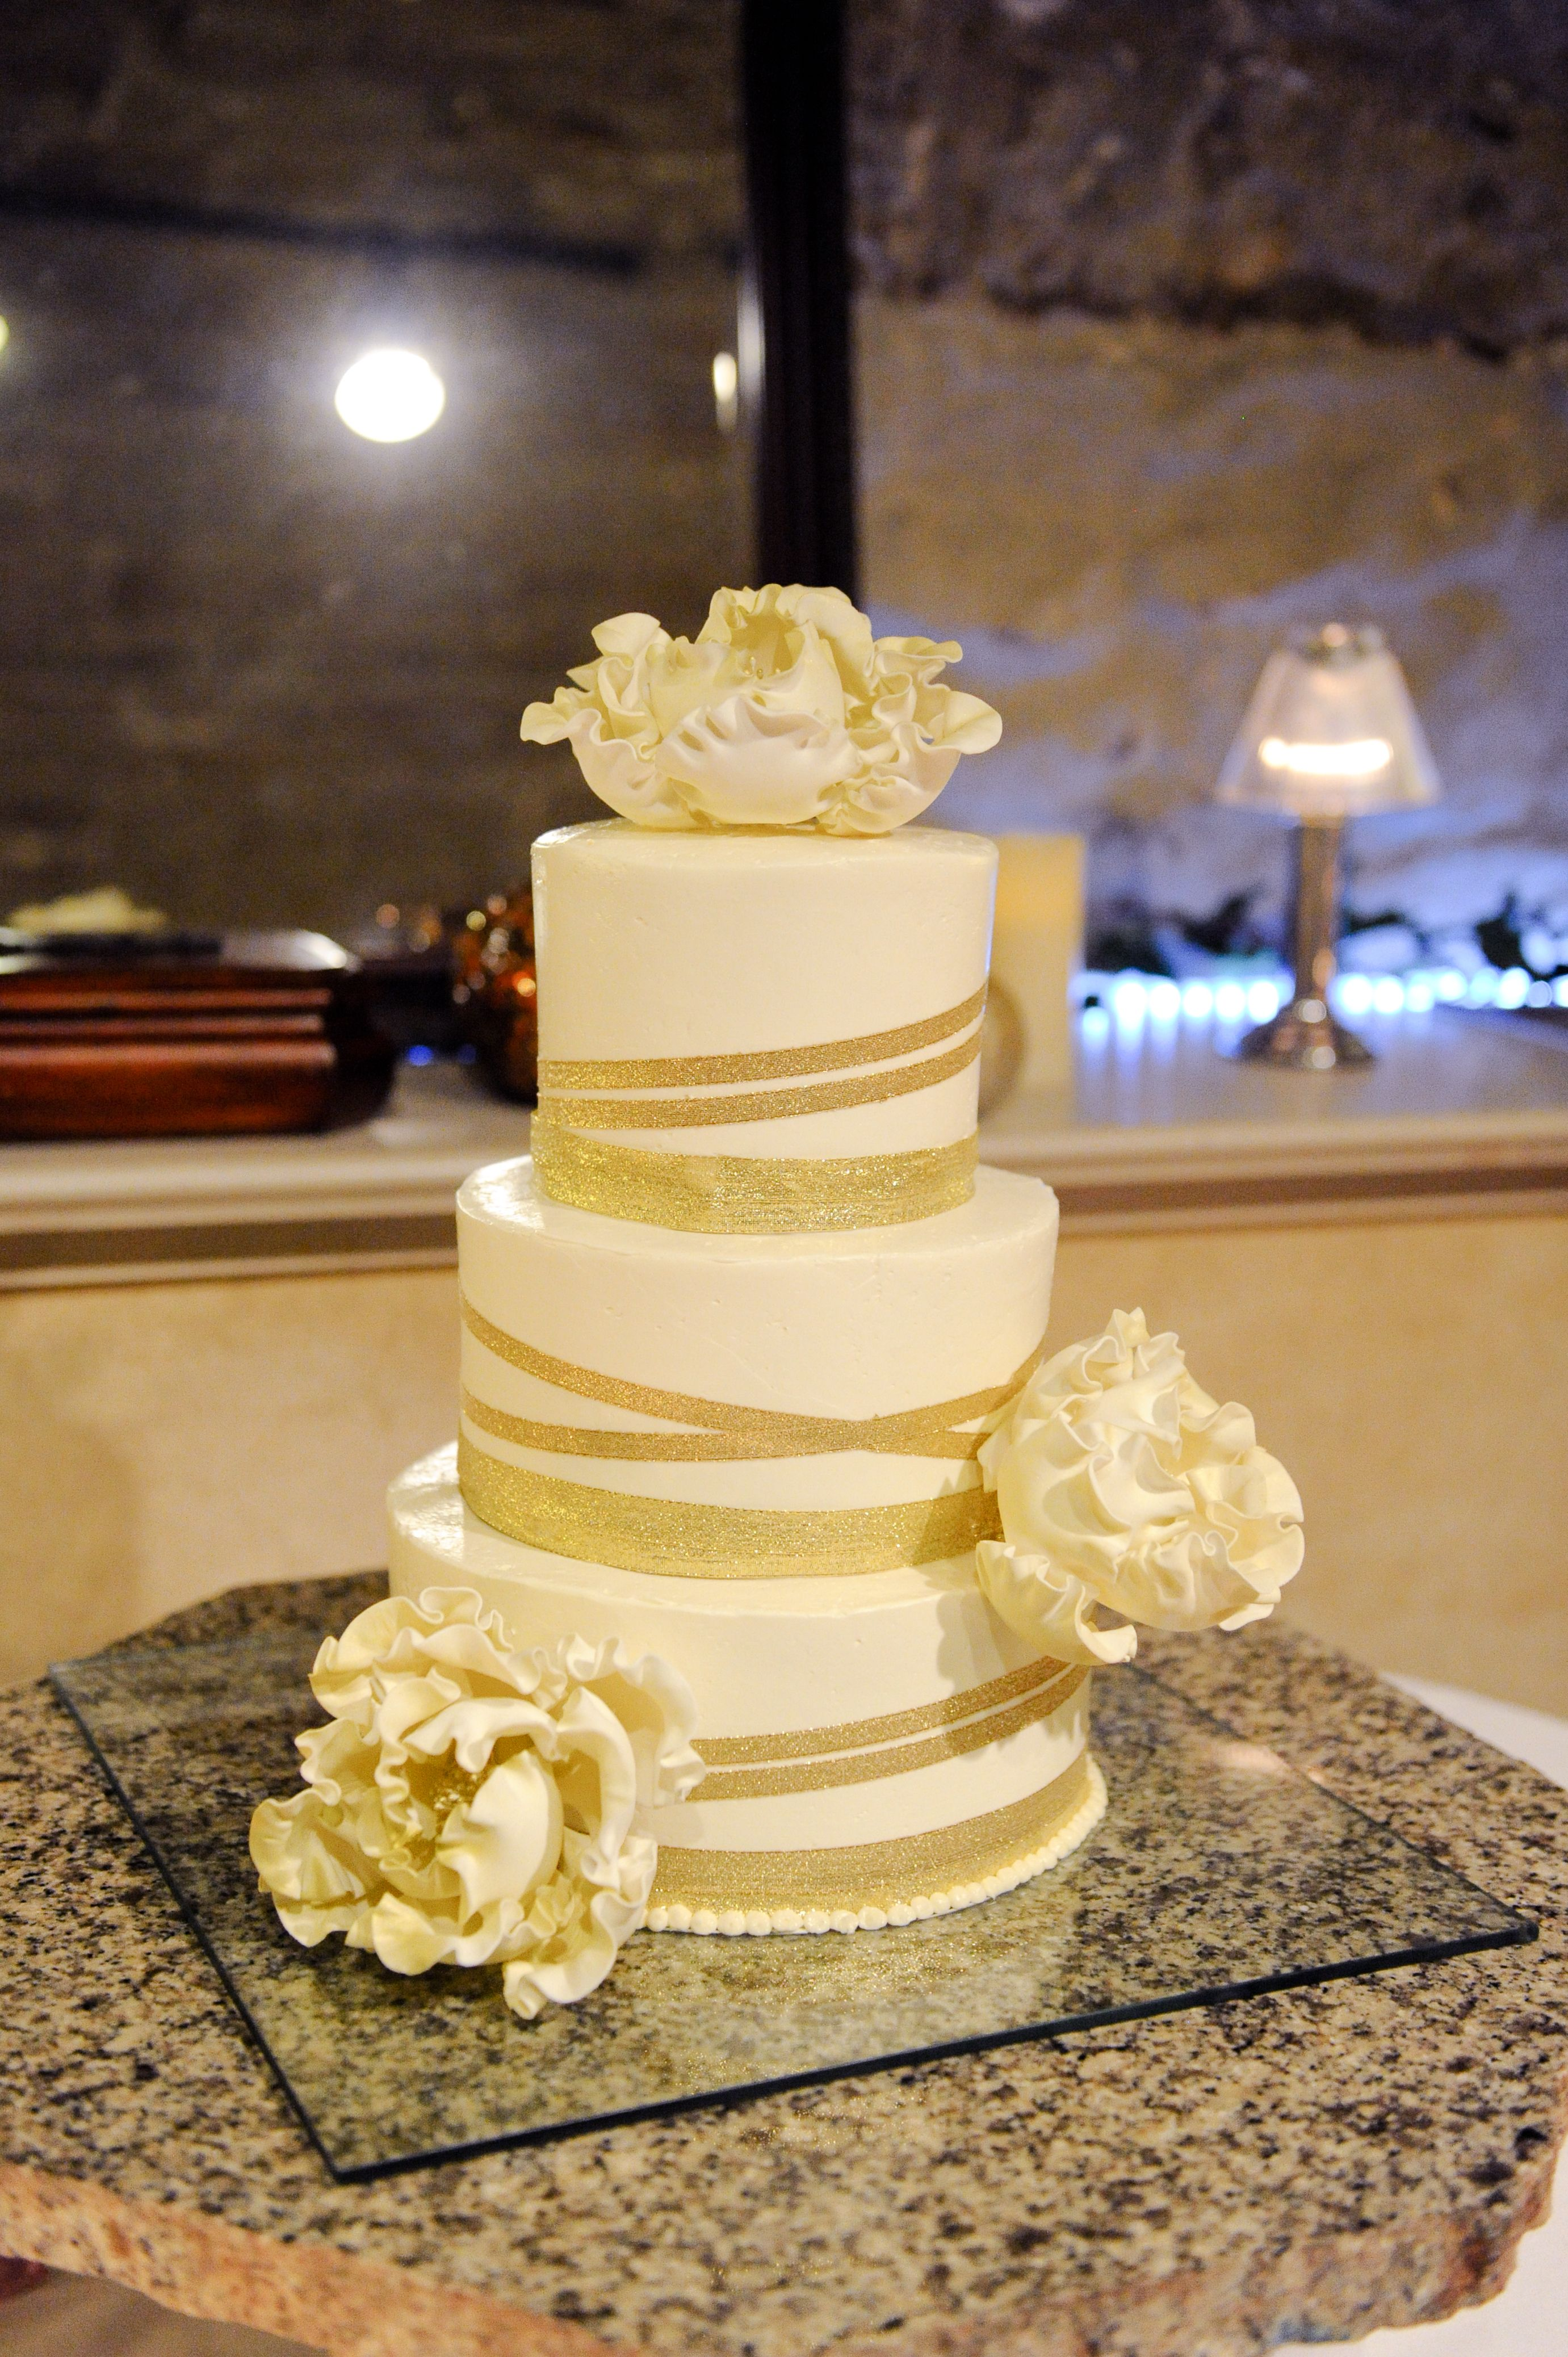 Romantic Wedding Cake | My October 2013 Wedding | Pinterest ...